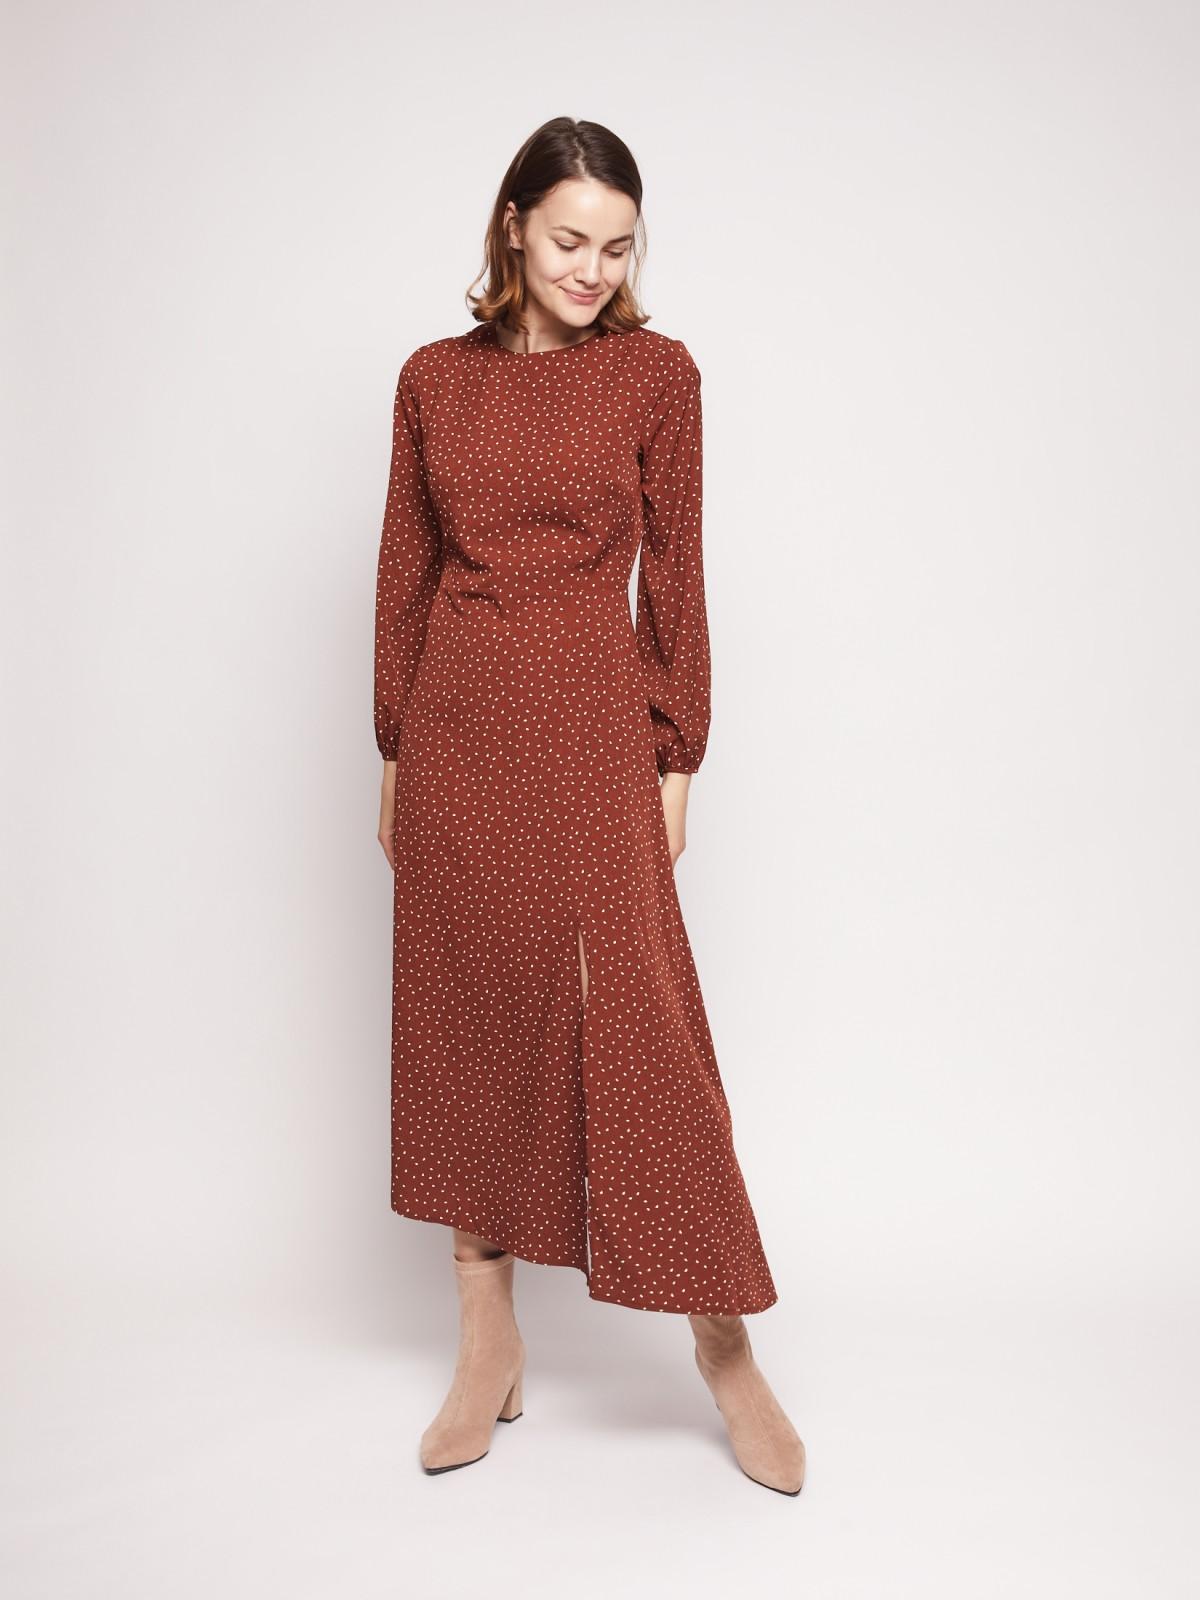 Платье женское Zolla 02133824018380P0 коричневое XXL